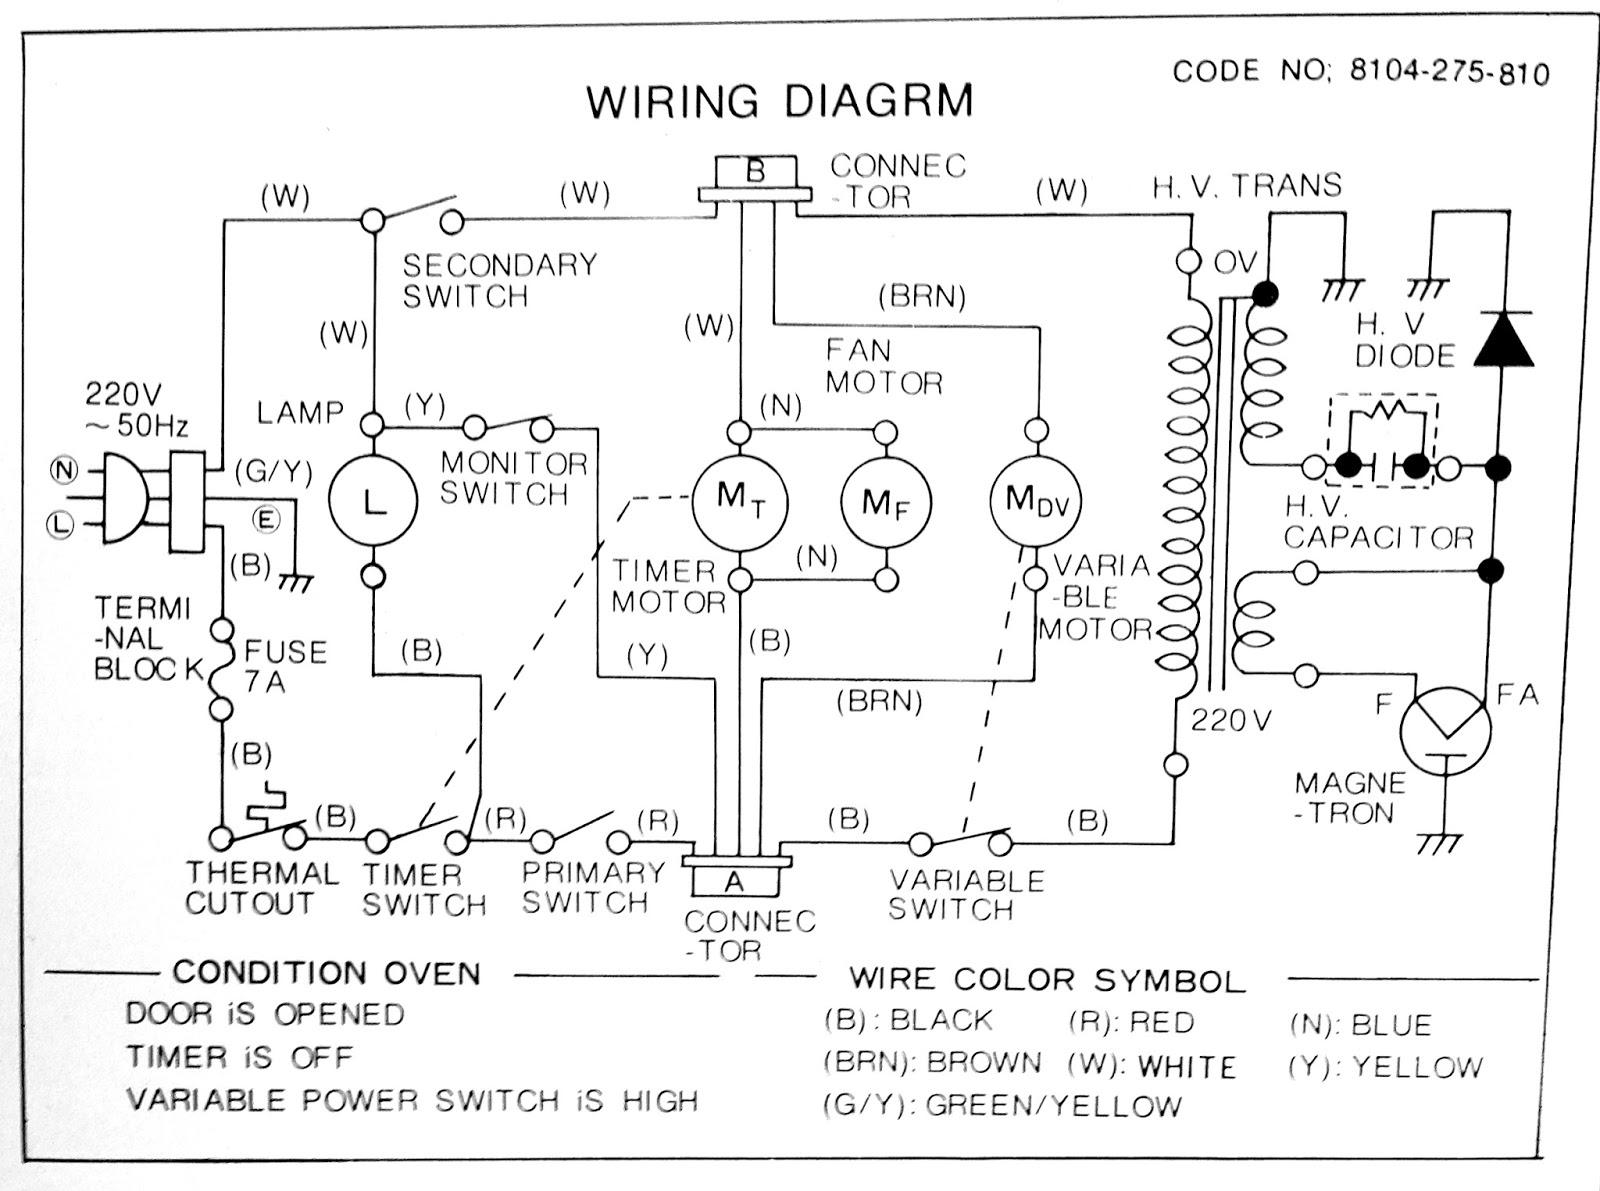 Microwave Mechanical Timer Wiring Diagram | Online Wiring